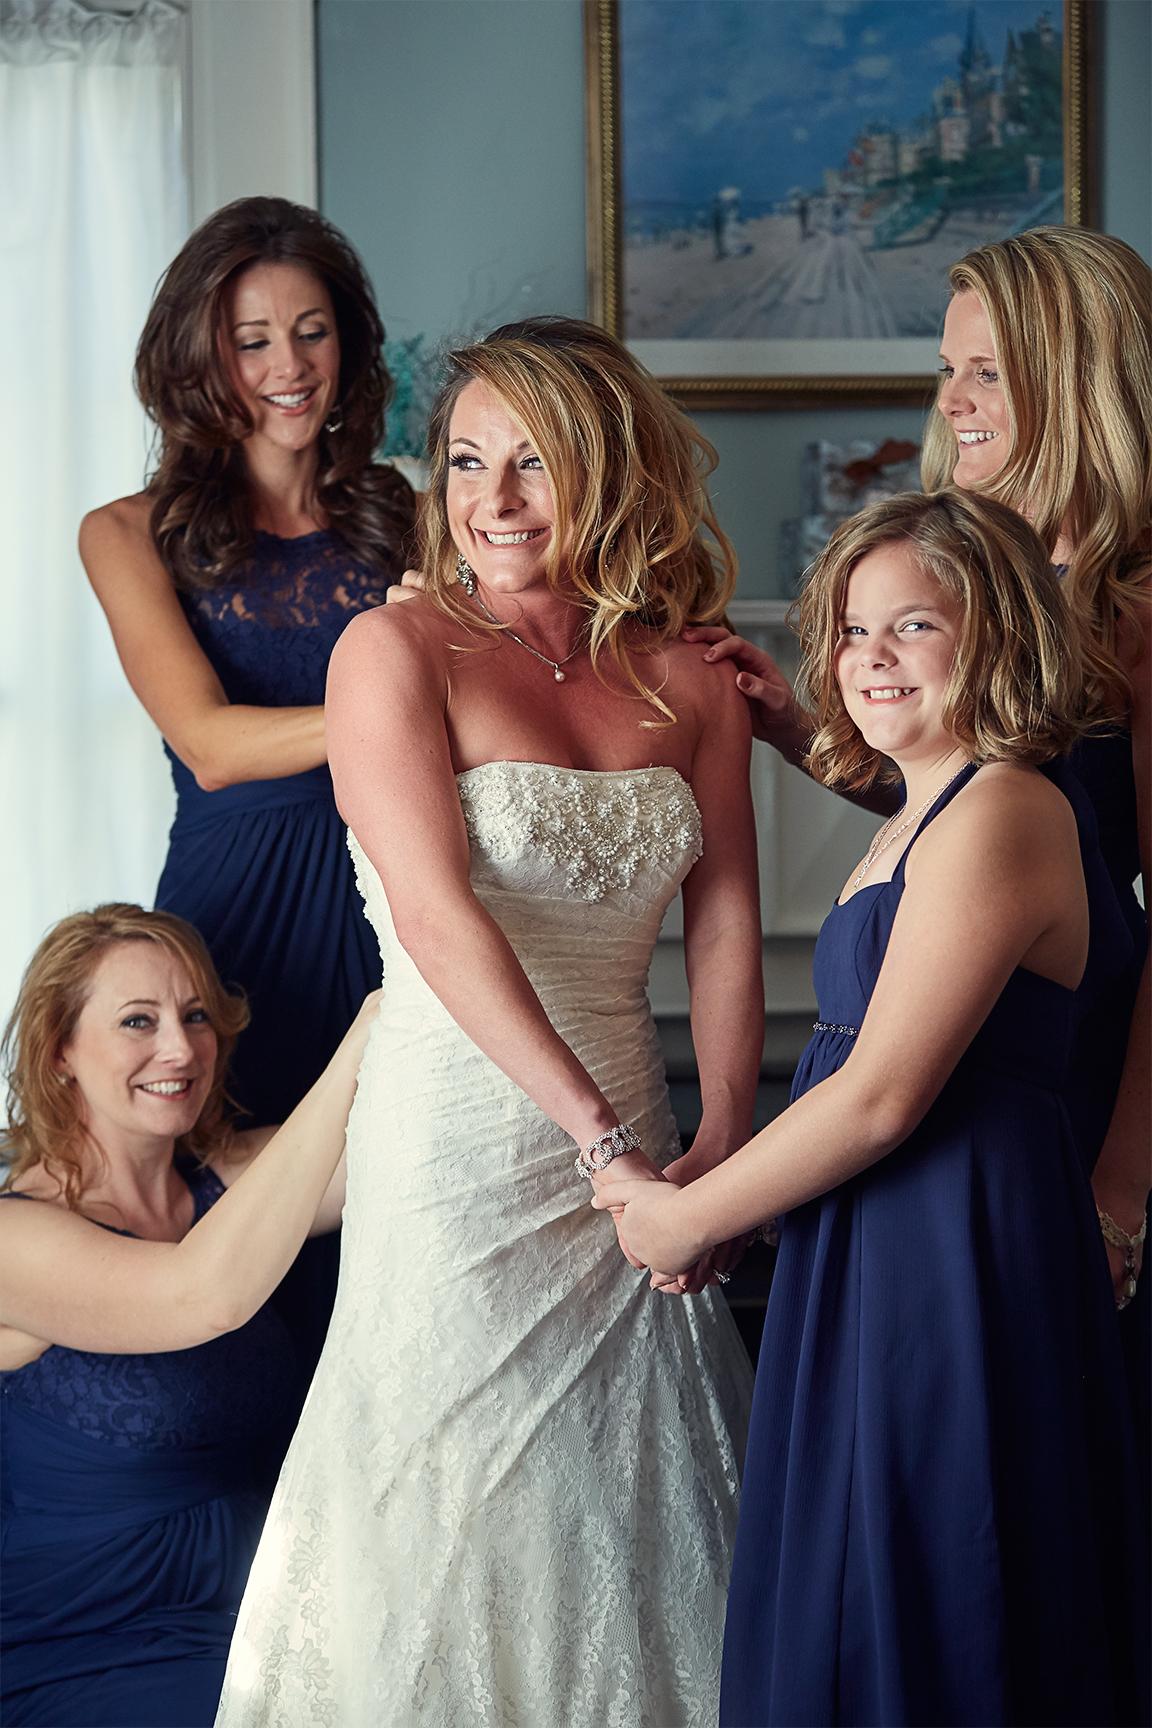 _RNE5229Tina-And-Miles-Wedding_N,2015_Raleigh_NC_ErnestoSue367.jpeg